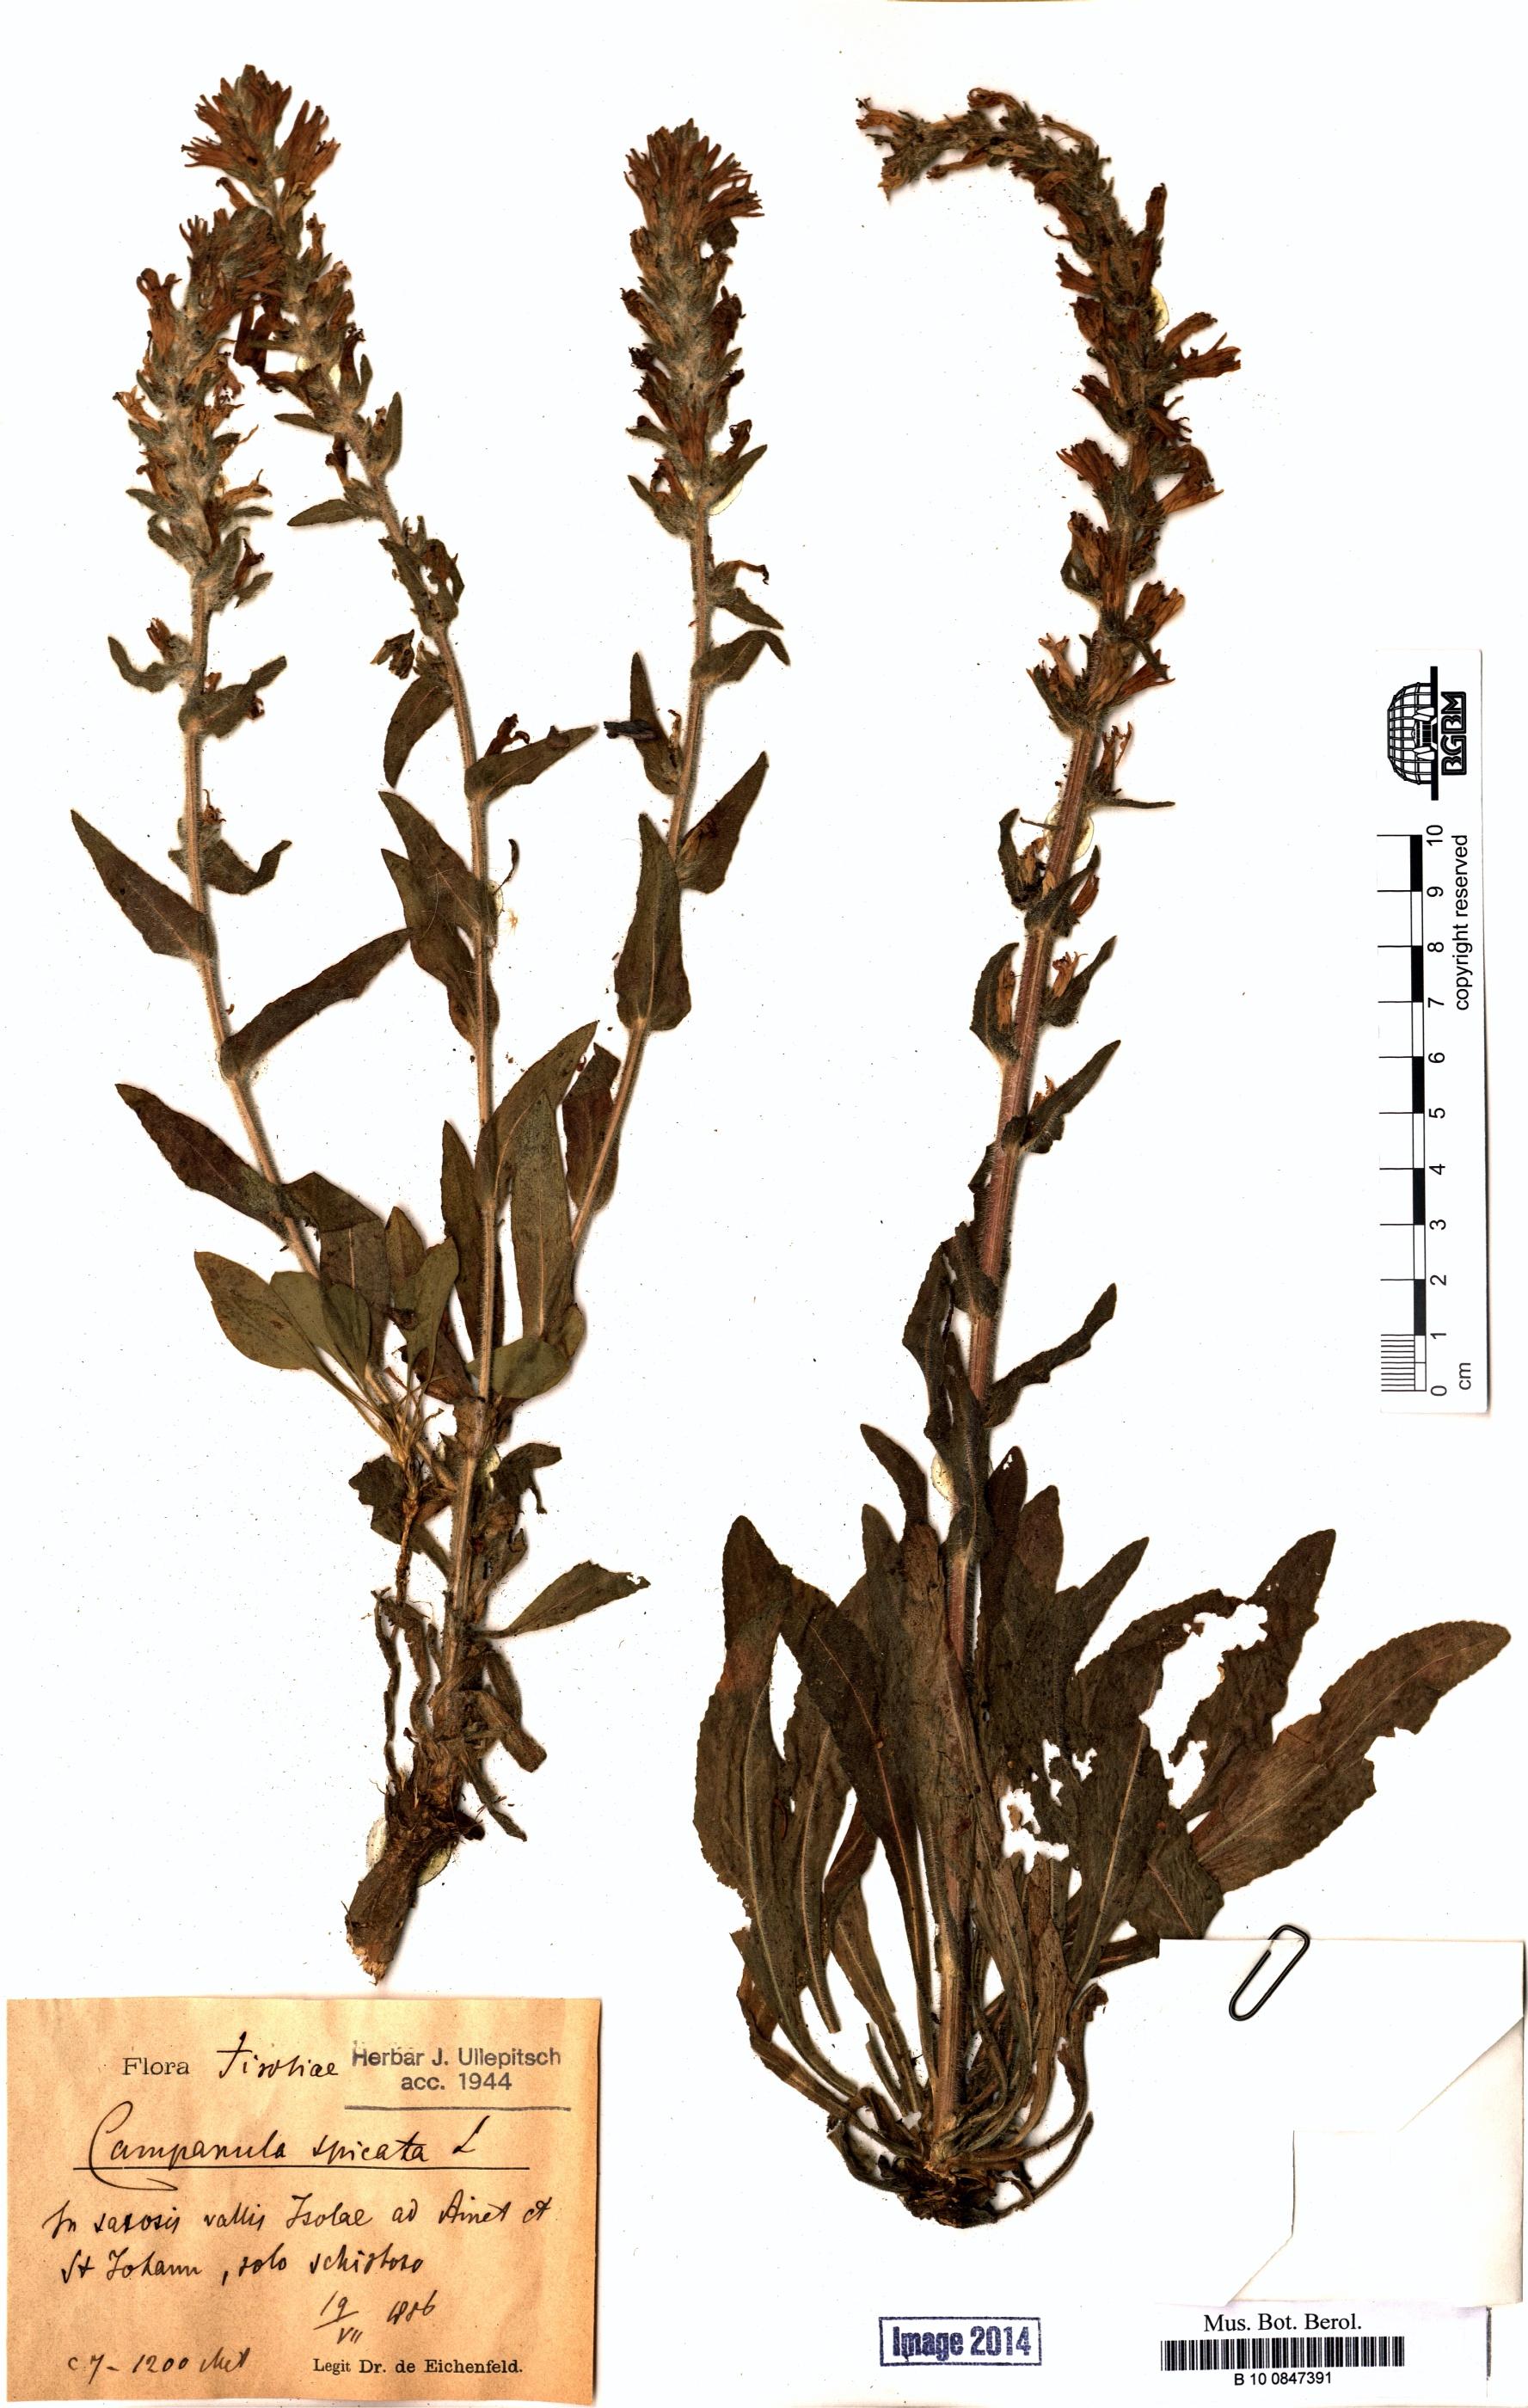 http://ww2.bgbm.org/herbarium/images/B/10/08/47/39/B_10_0847391.jpg